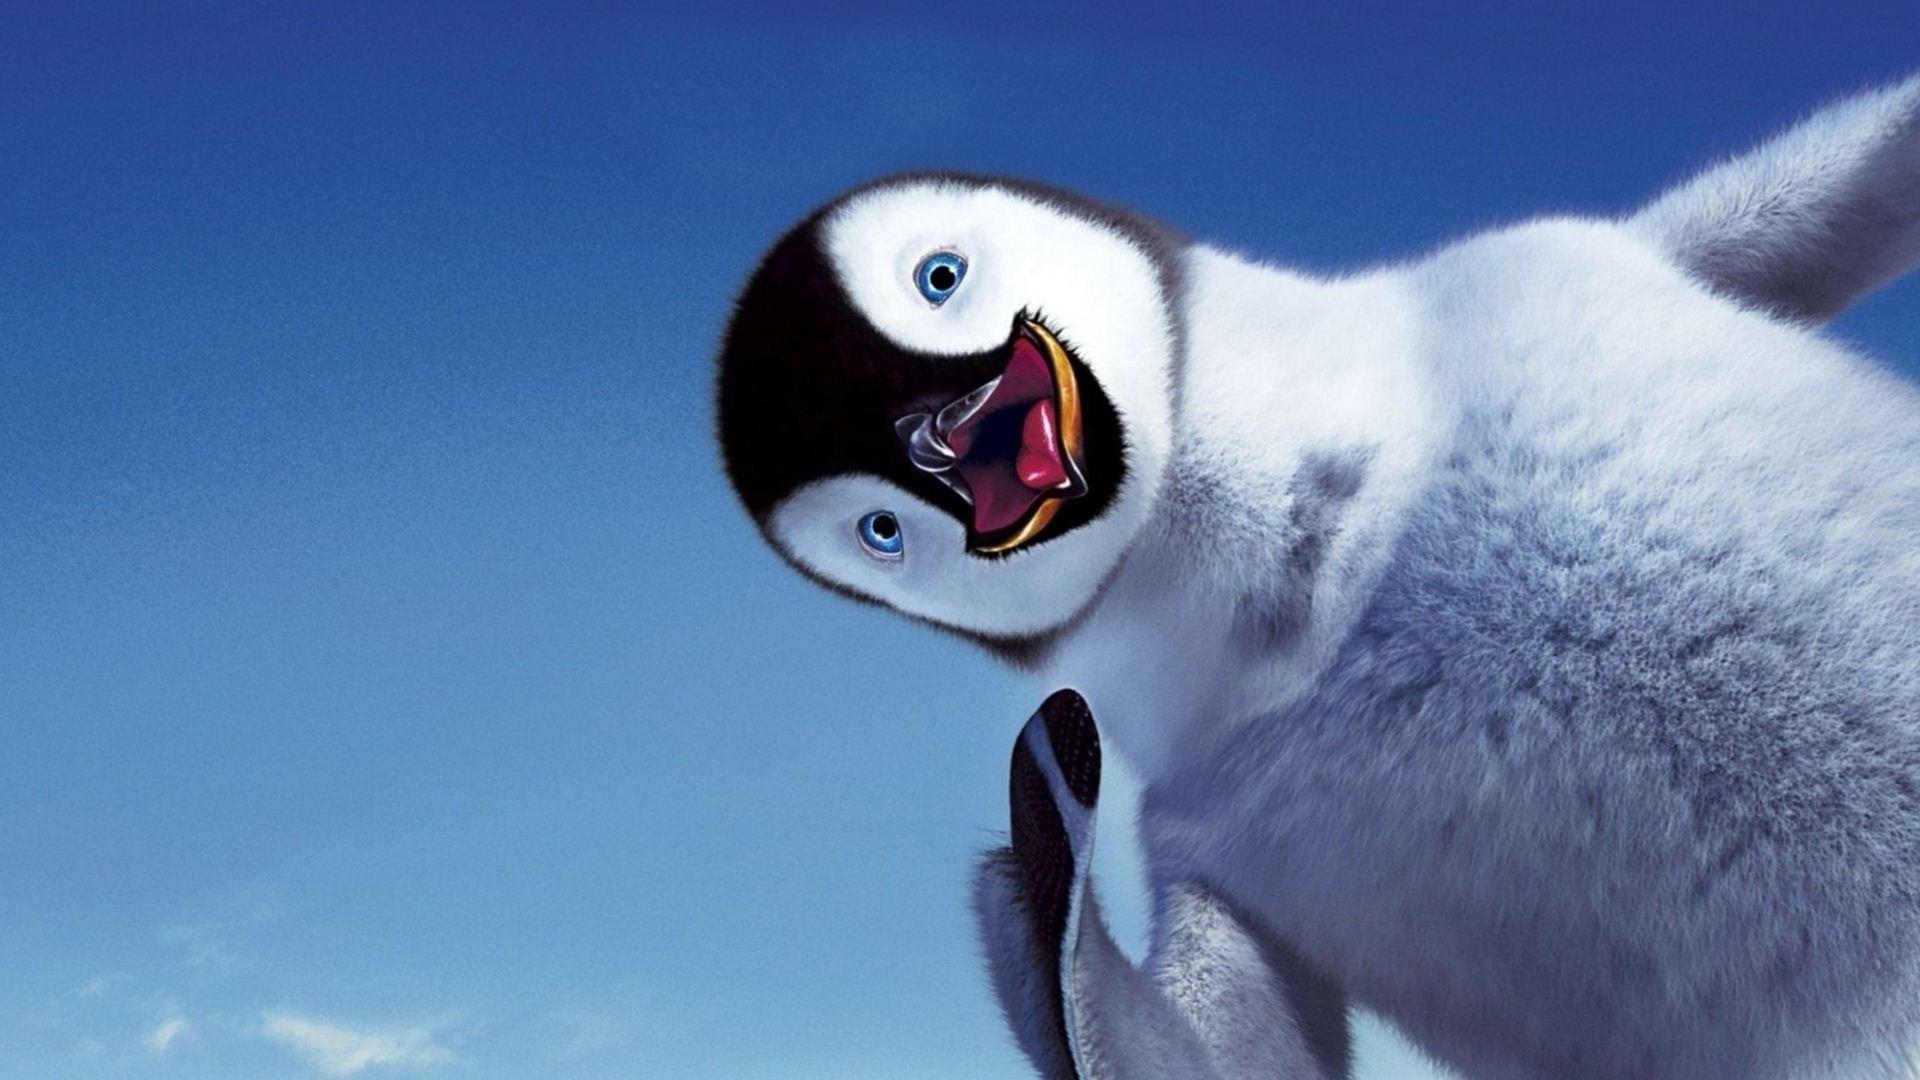 Penguin Fun wallpaper 1920x1080